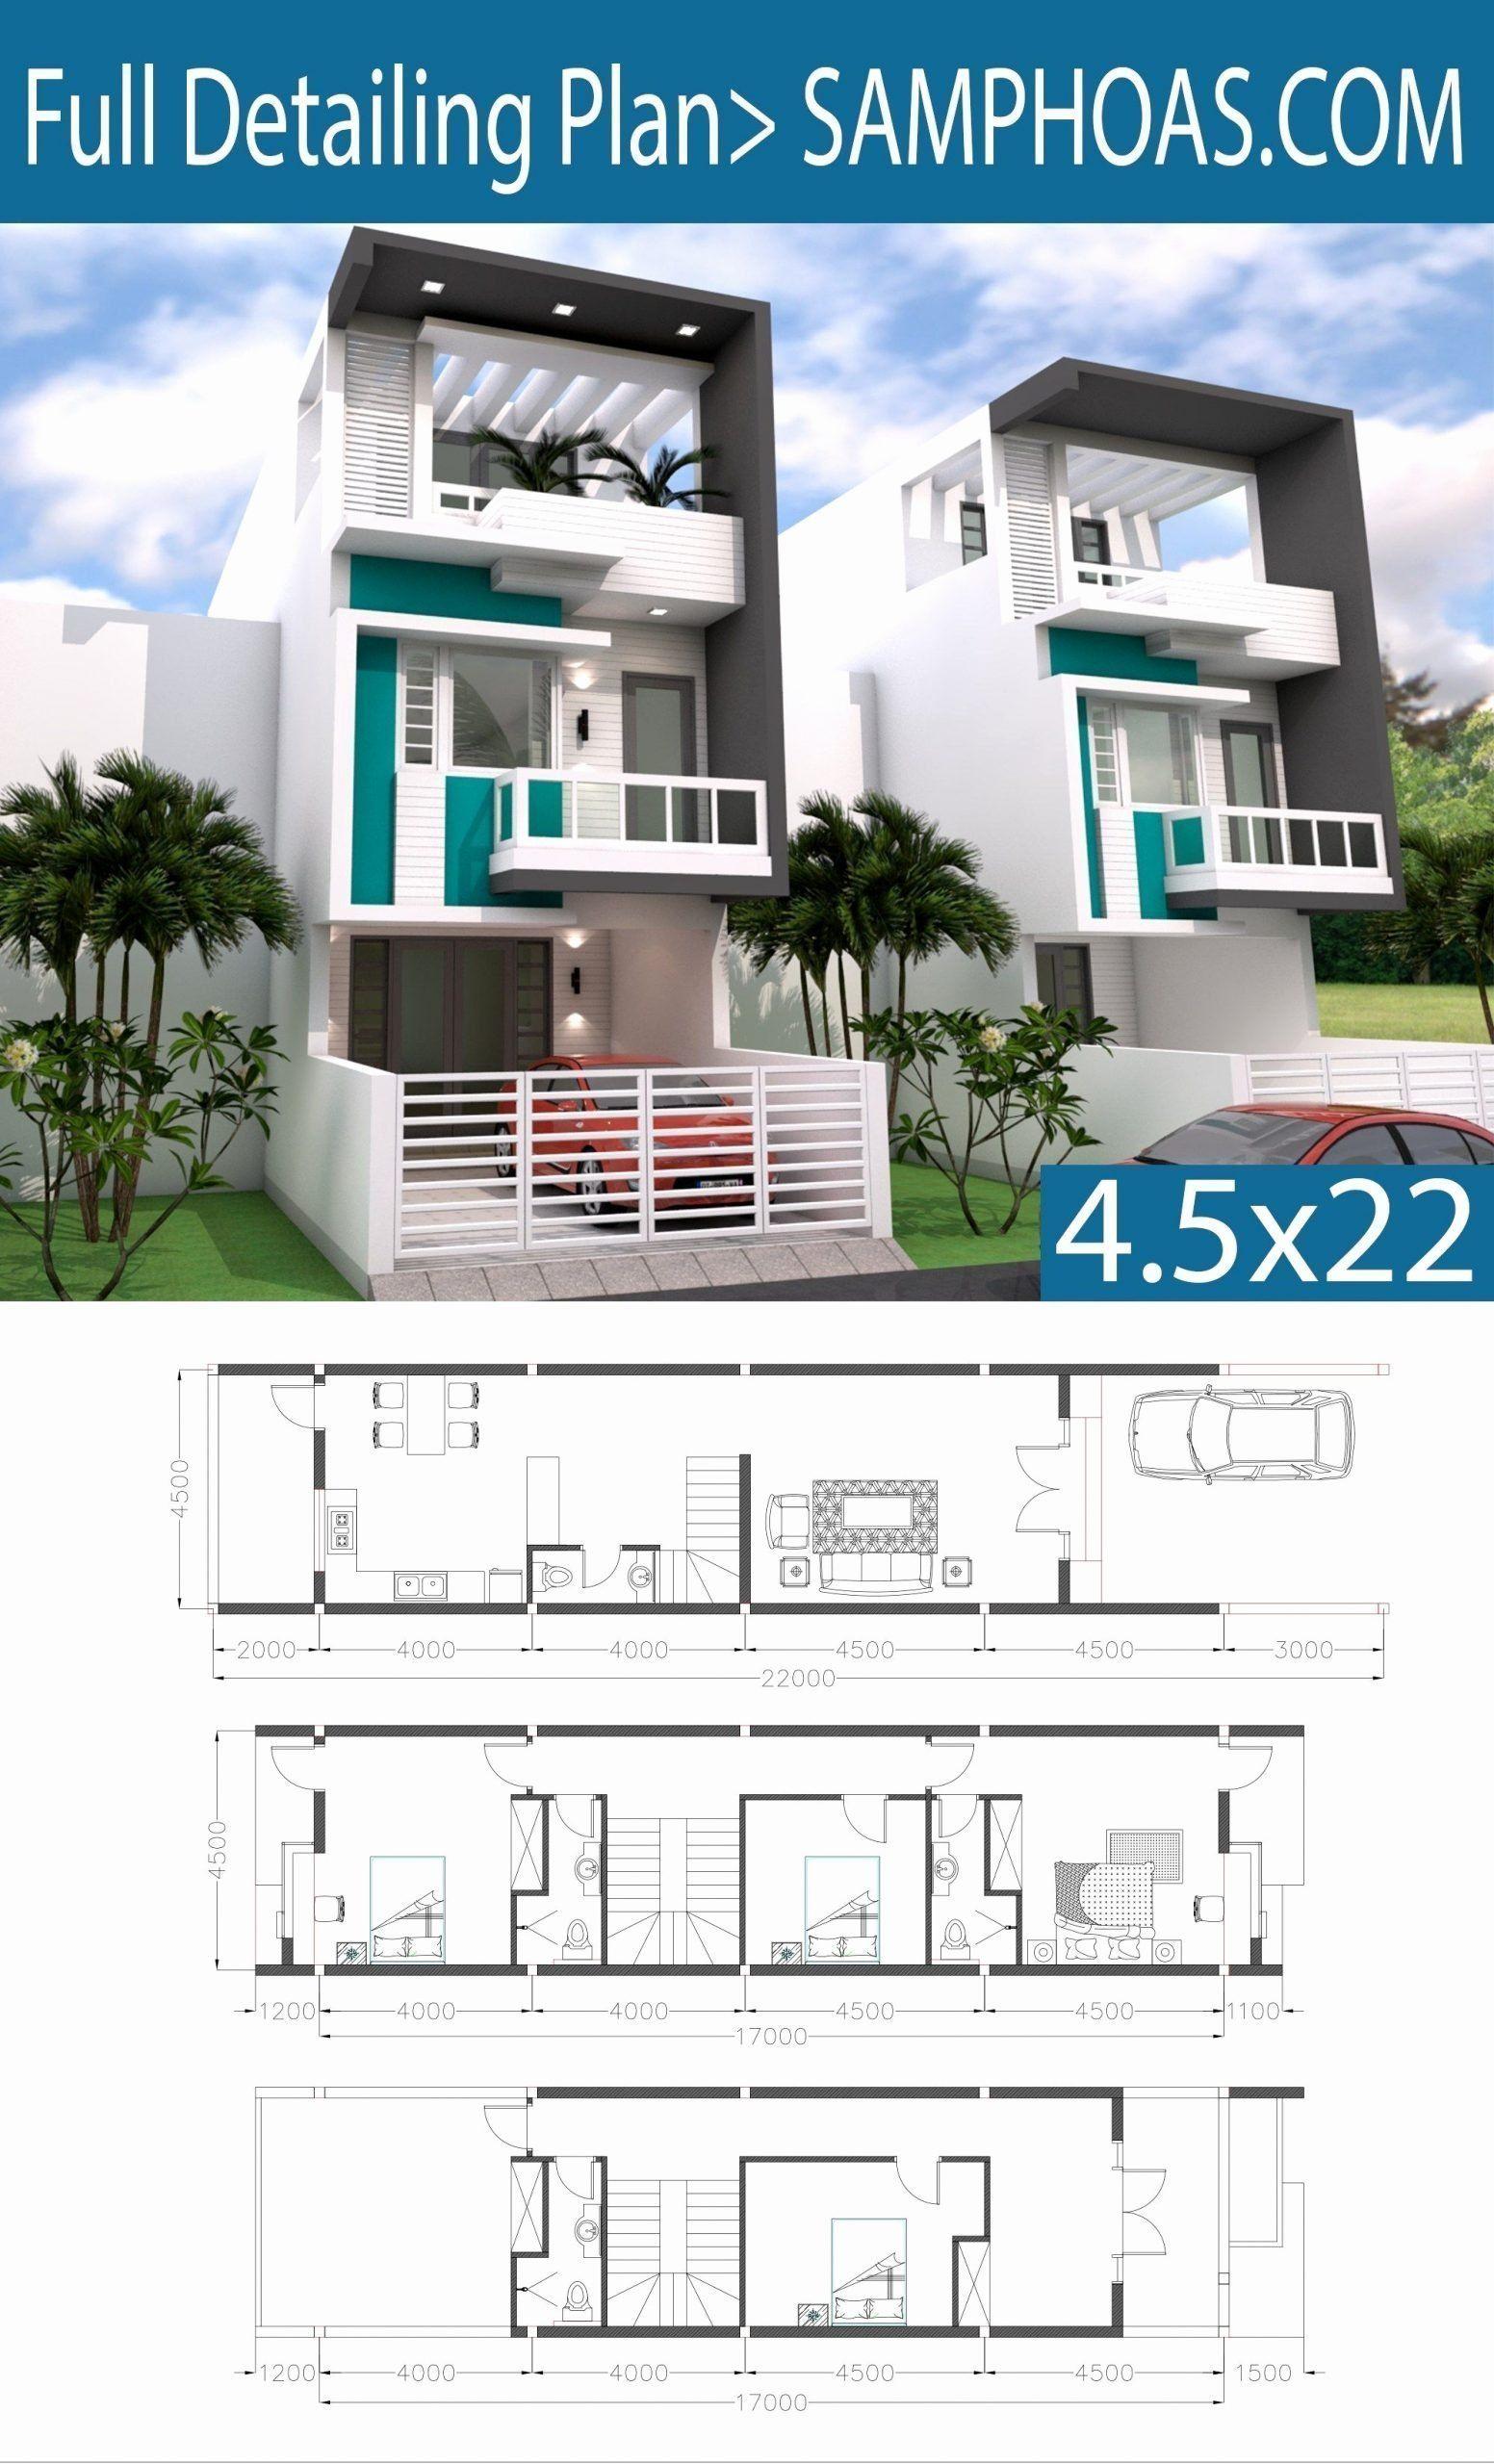 Narrow Home Design Plans Beautiful Sketchup 3 Story Narrow Home Plan 4 5x20m Samphoas Plan Narrow House Plans Model House Plan Architectural House Plans